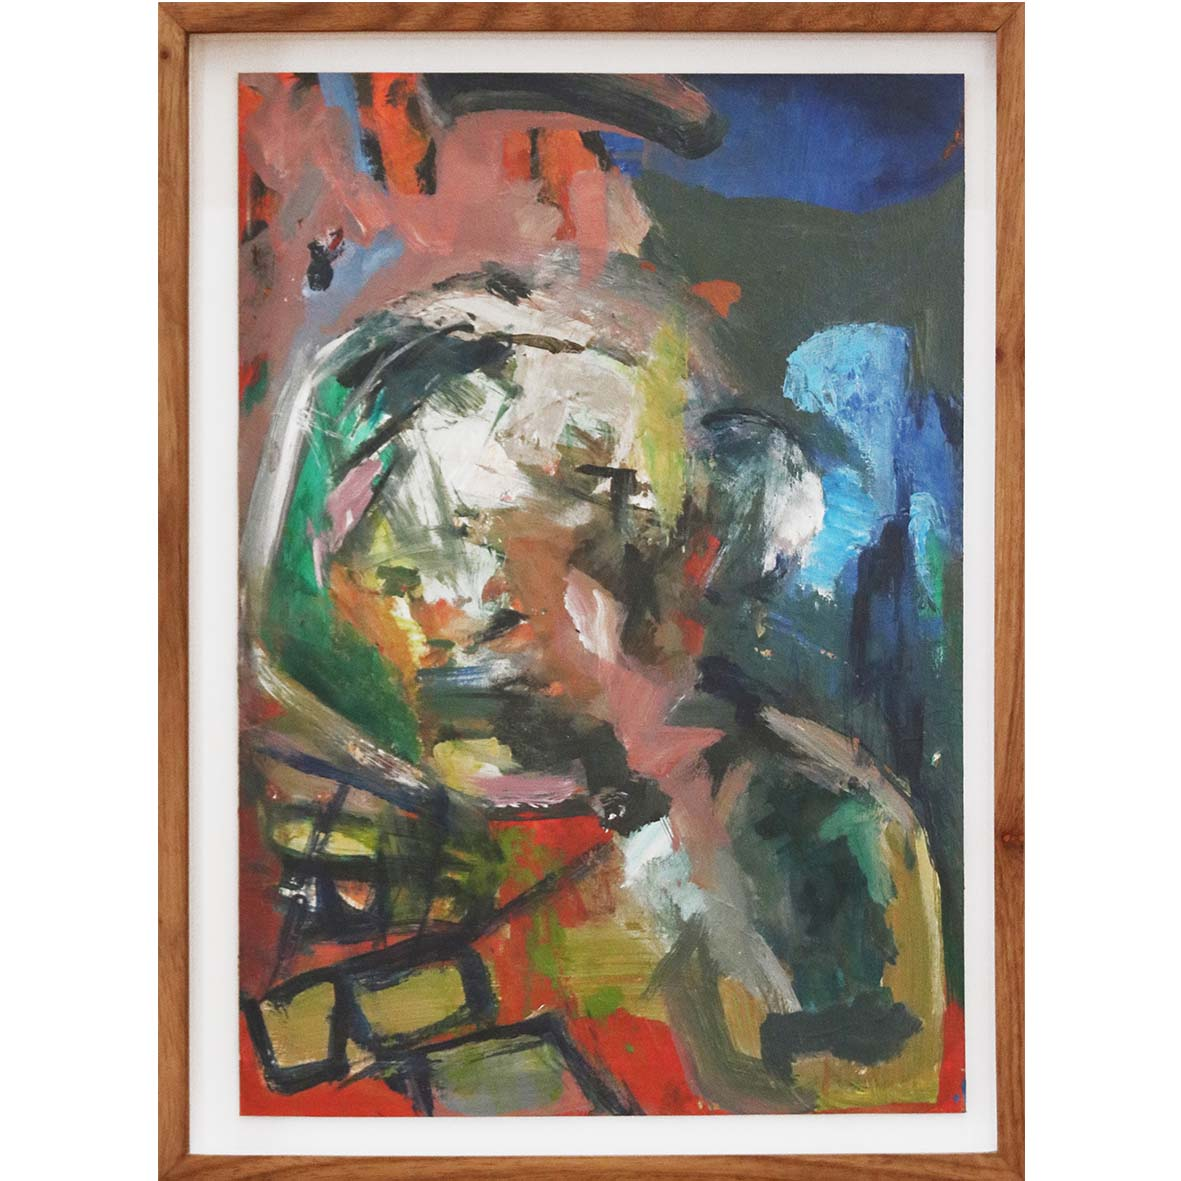 Nina Holmes Sensory Overload 2019 Acrylic on paper 47 x 35 cm